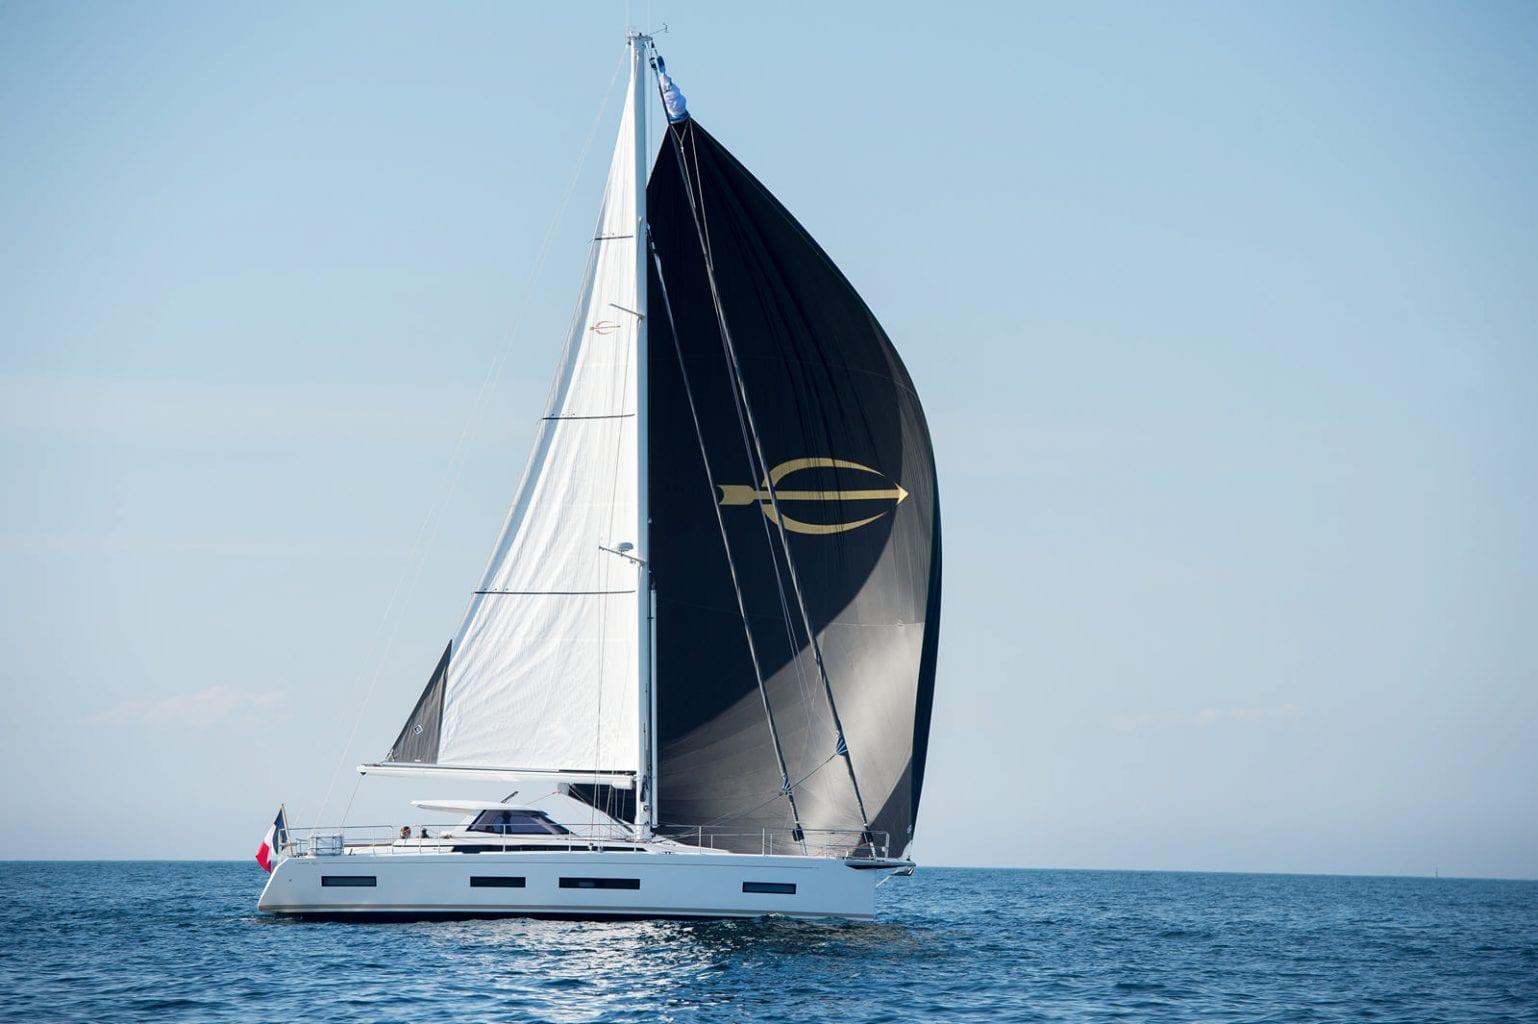 AMEL YACHTS - Stream Yachts